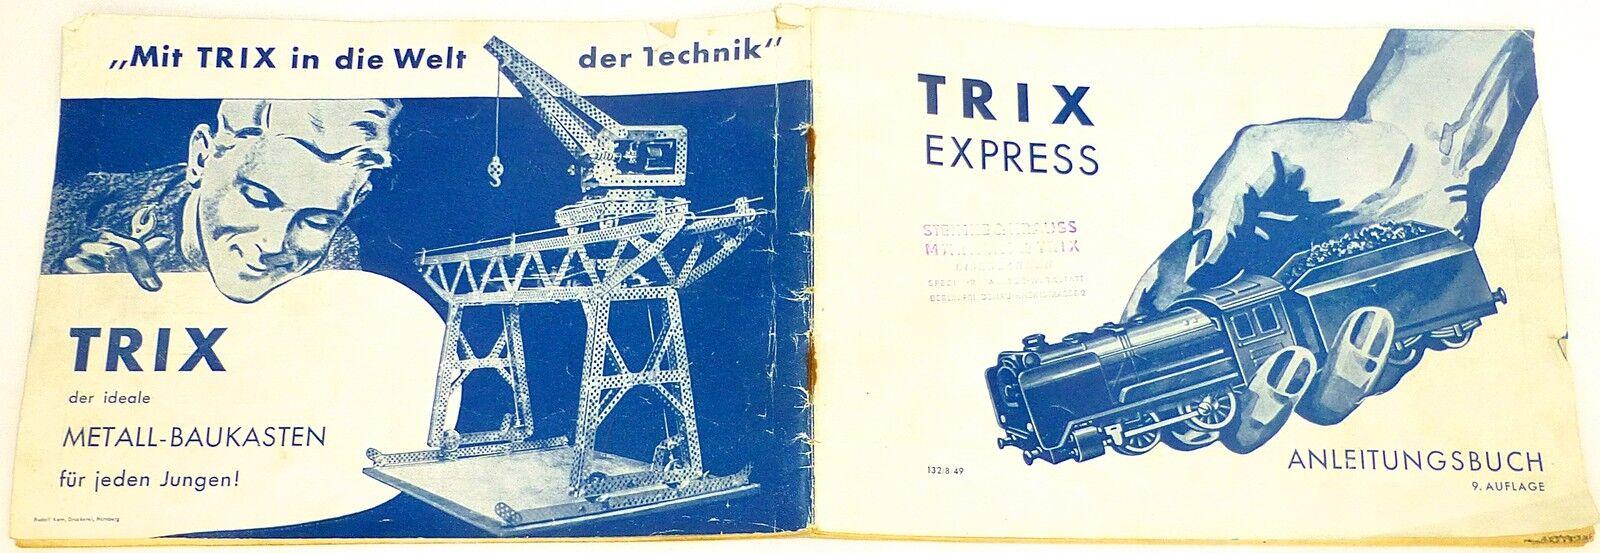 Trix express anleitungsbuch 9te auflage 132 8 49 H0 1 87 å